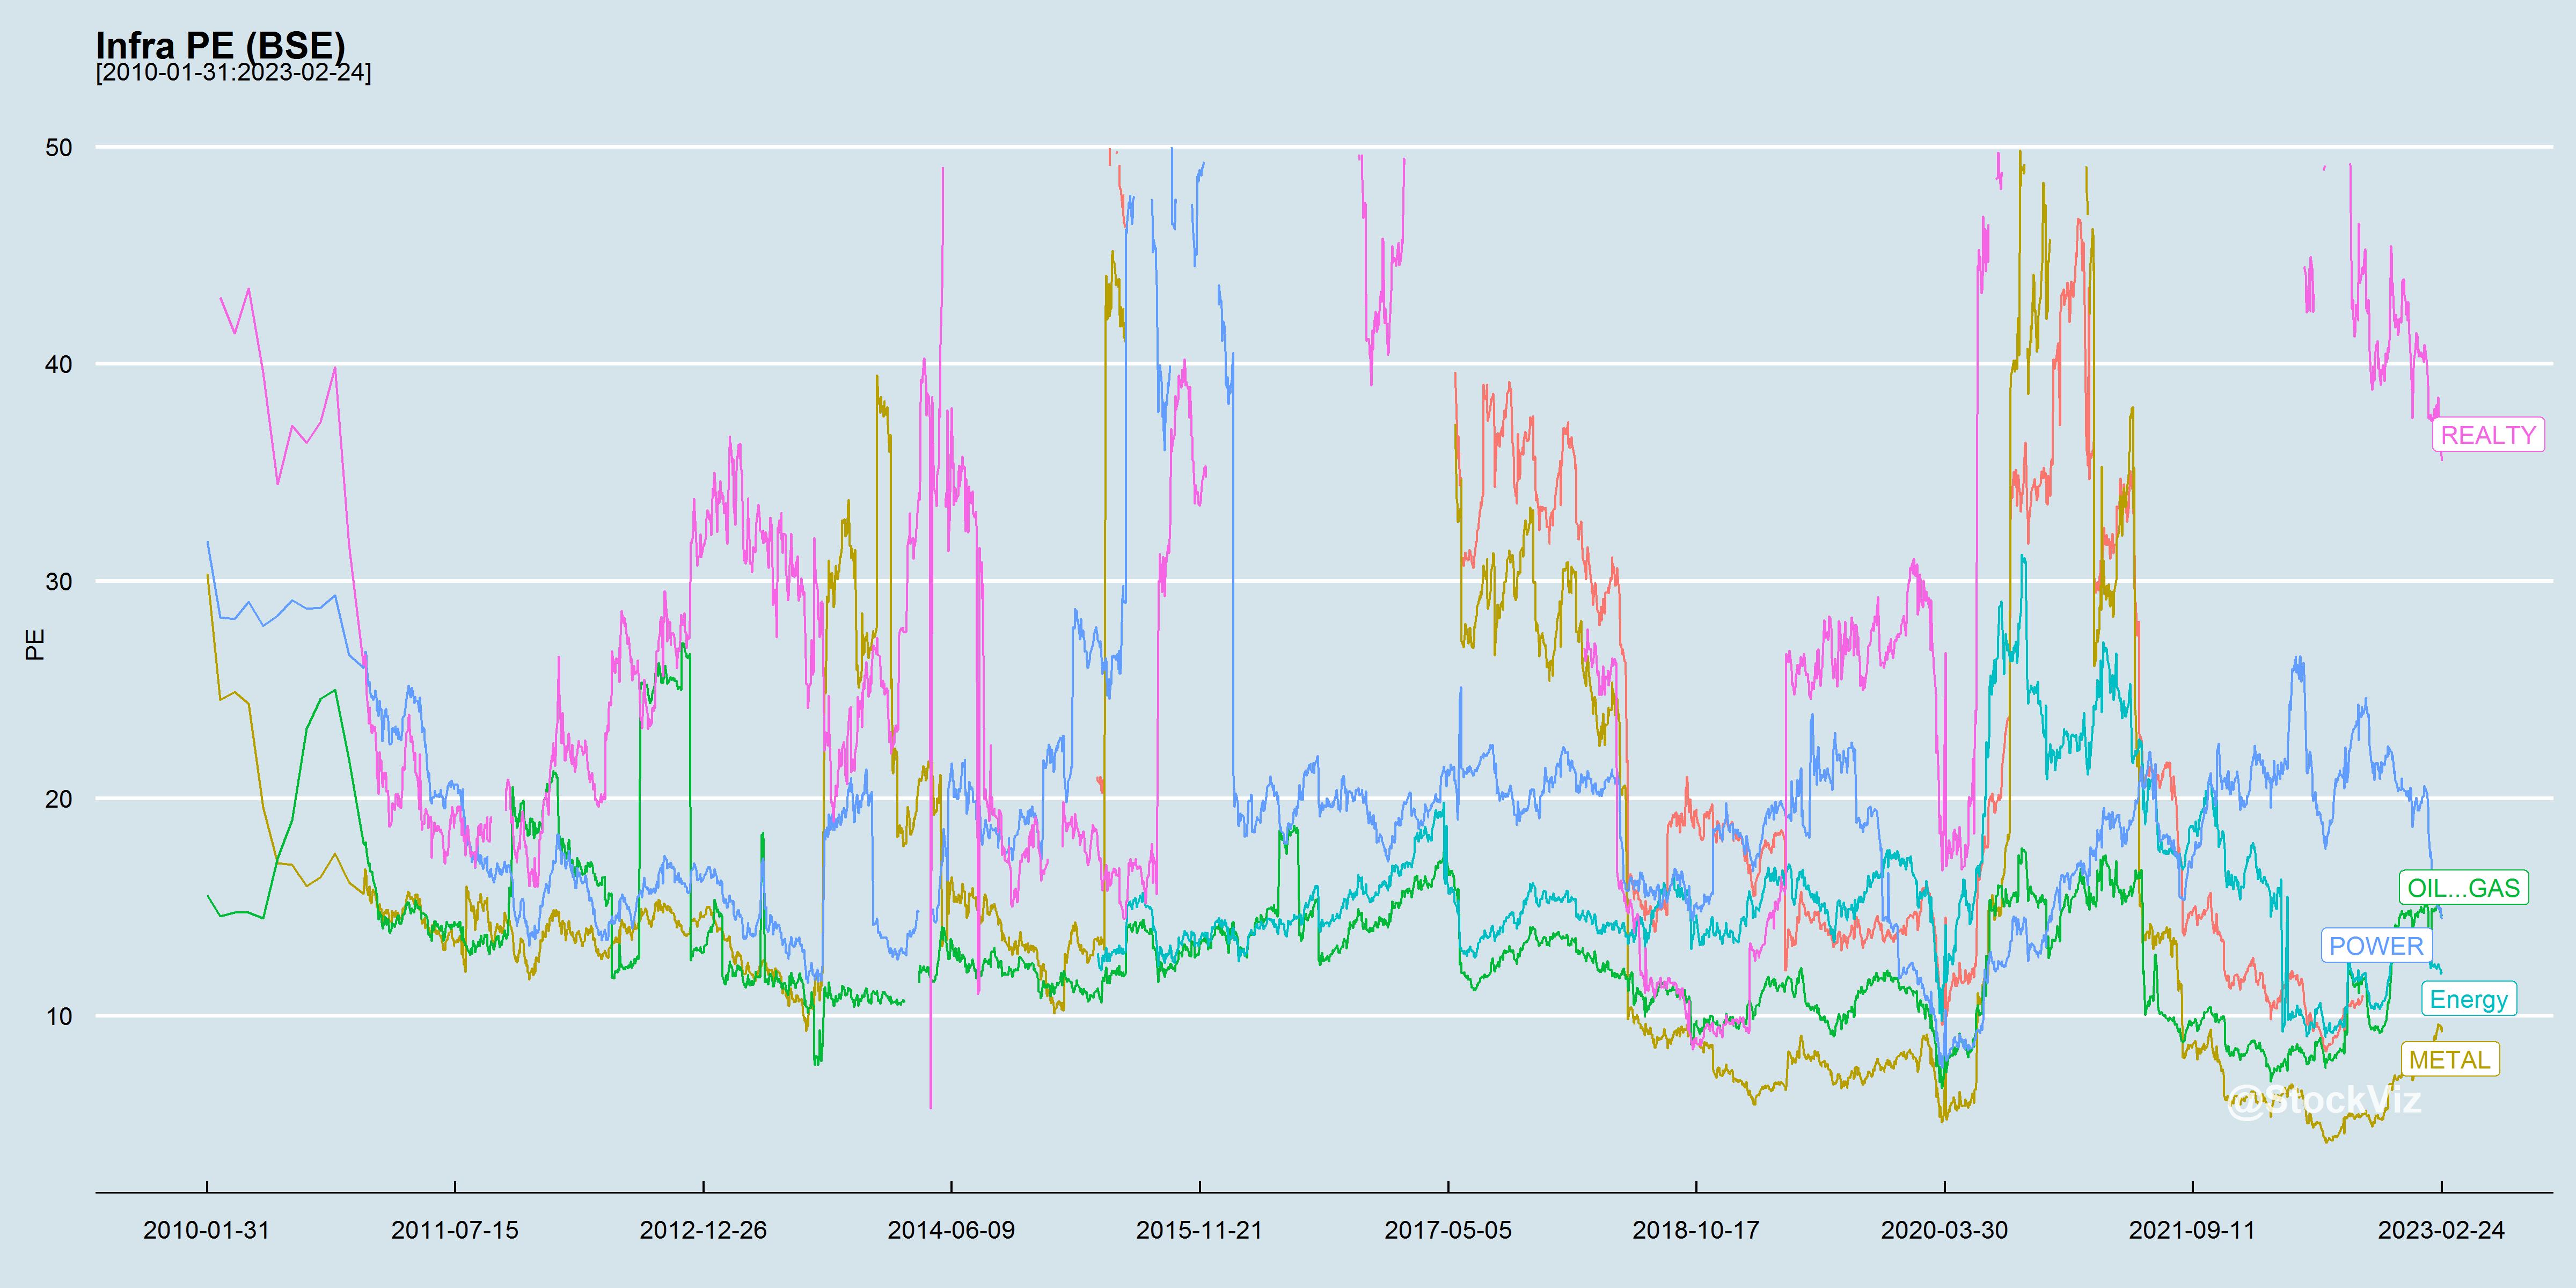 Infra PE chart